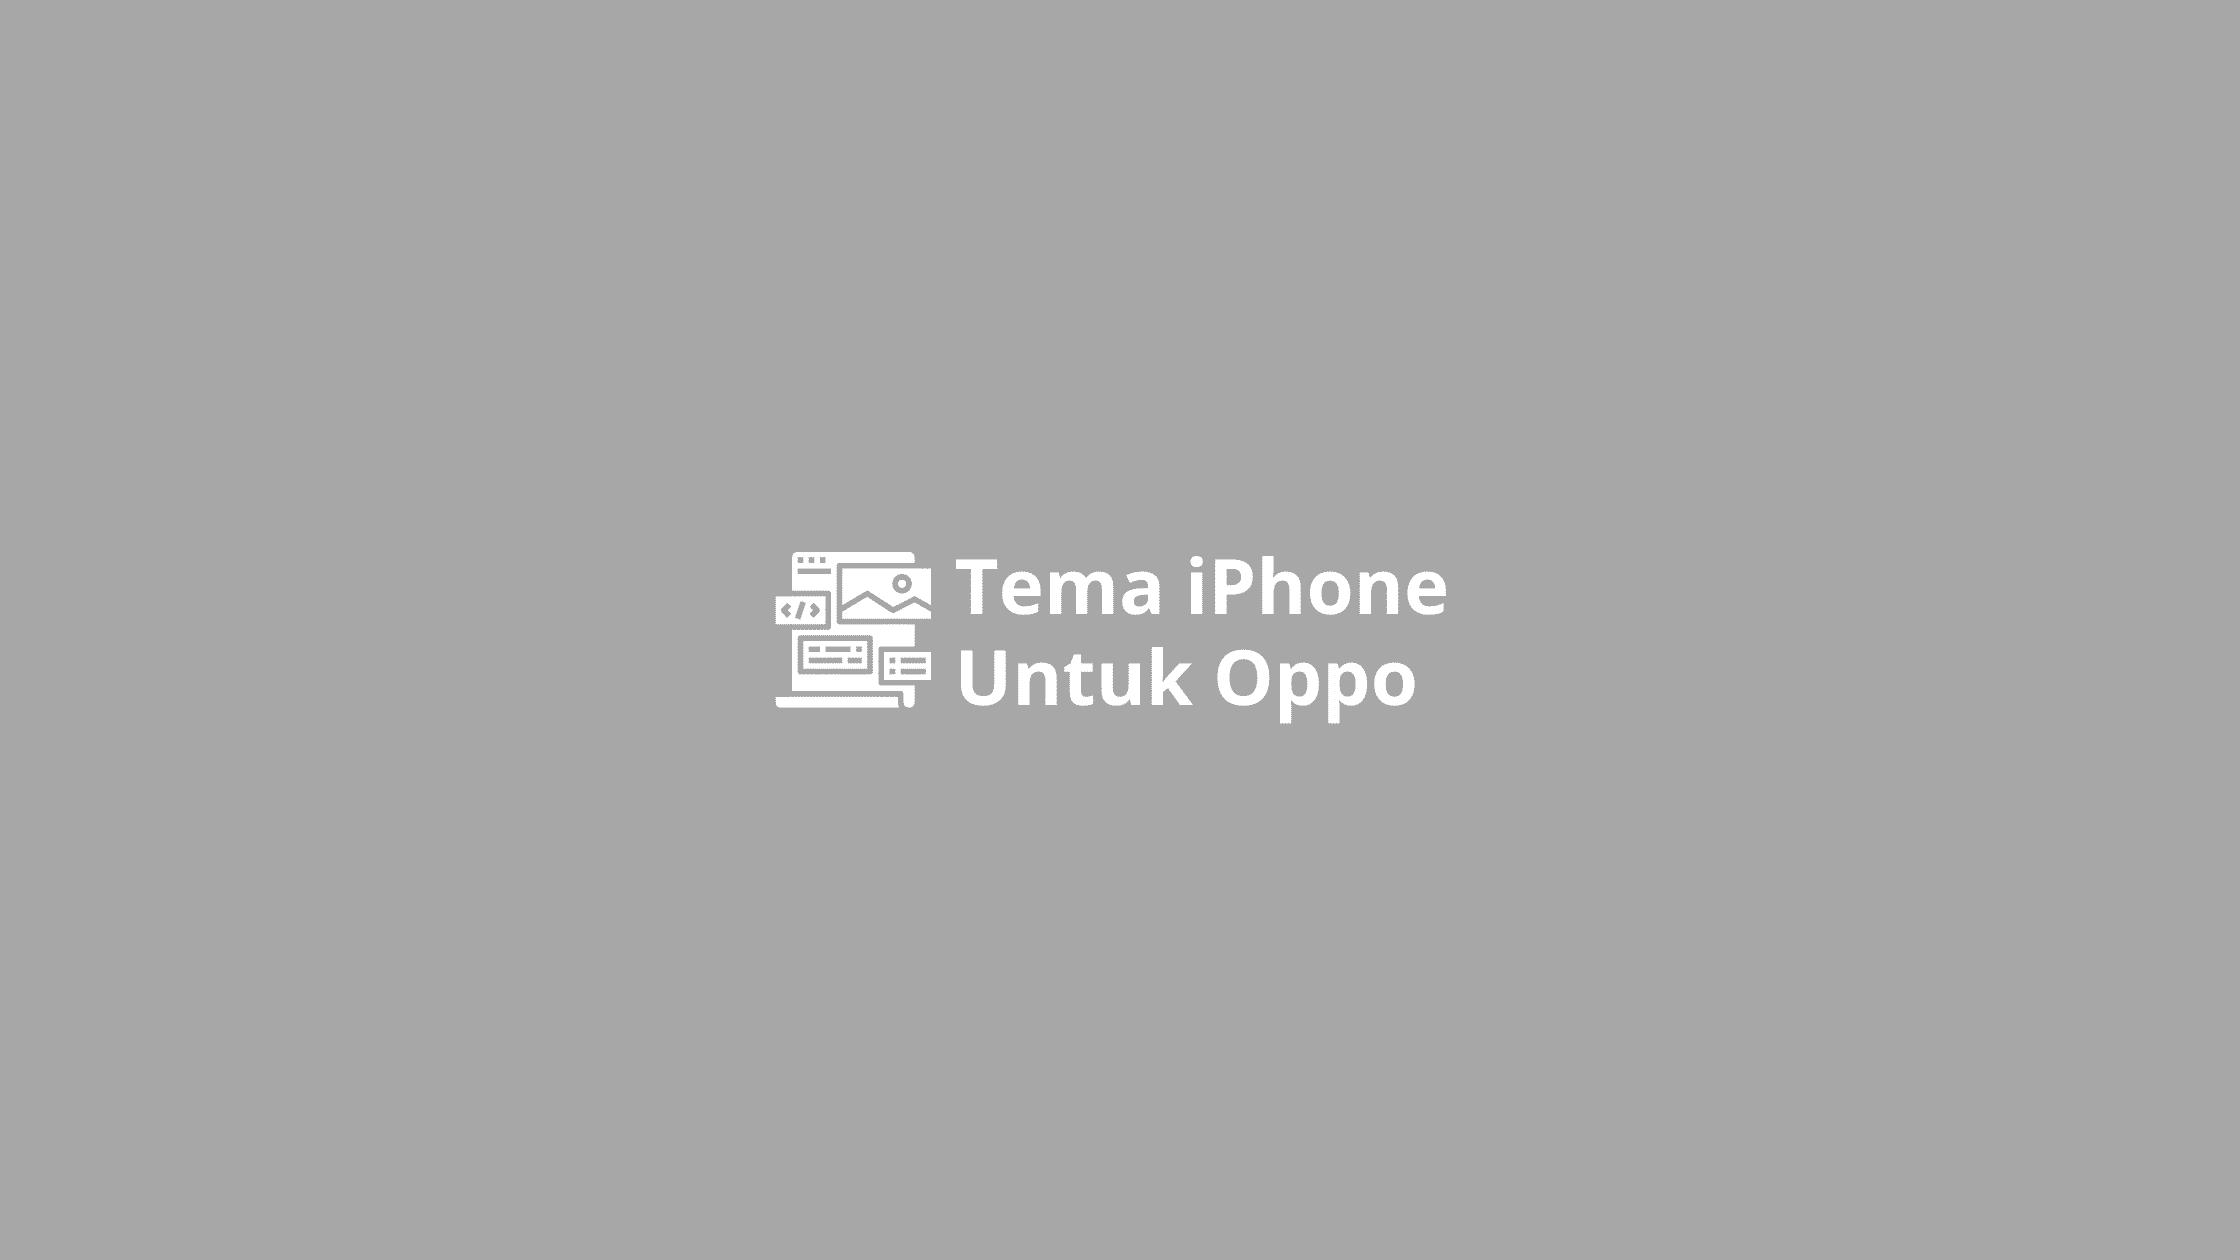 tema iphone untuk oppo